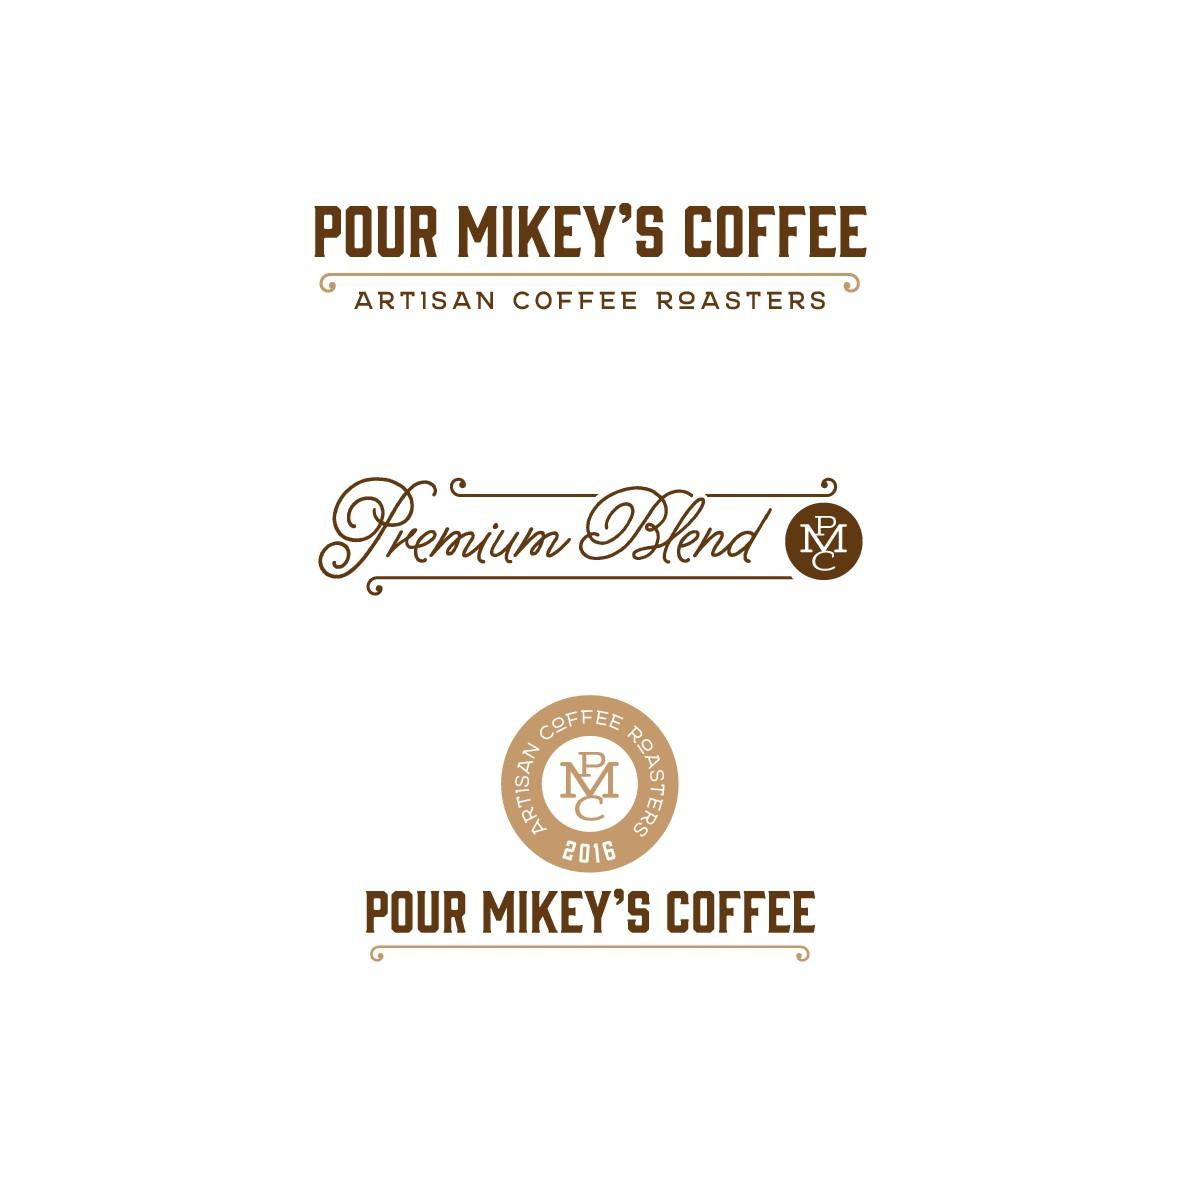 Artisan Coffee Roasters Logo Design